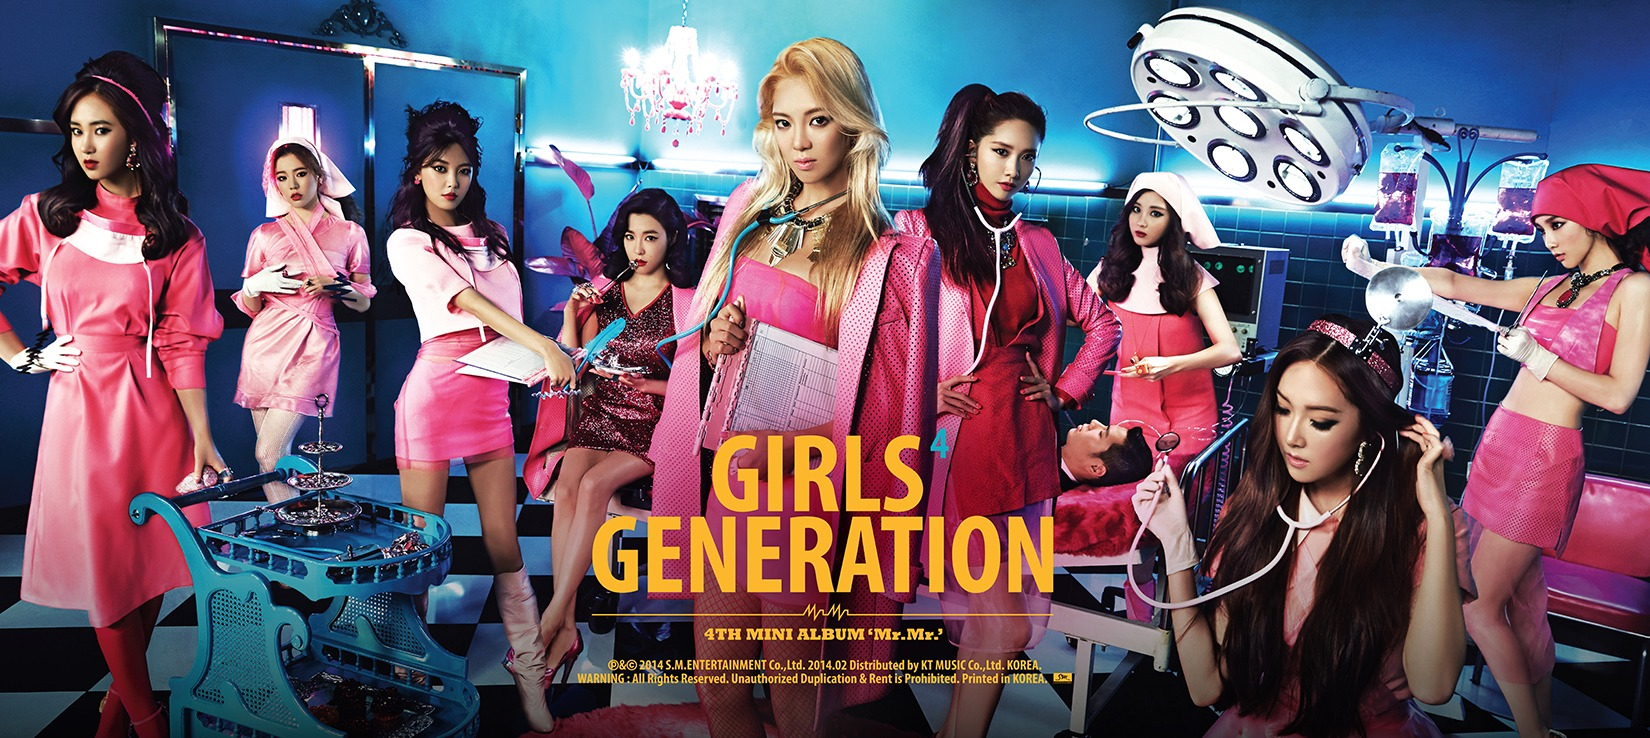 girls-generation-mrmr2